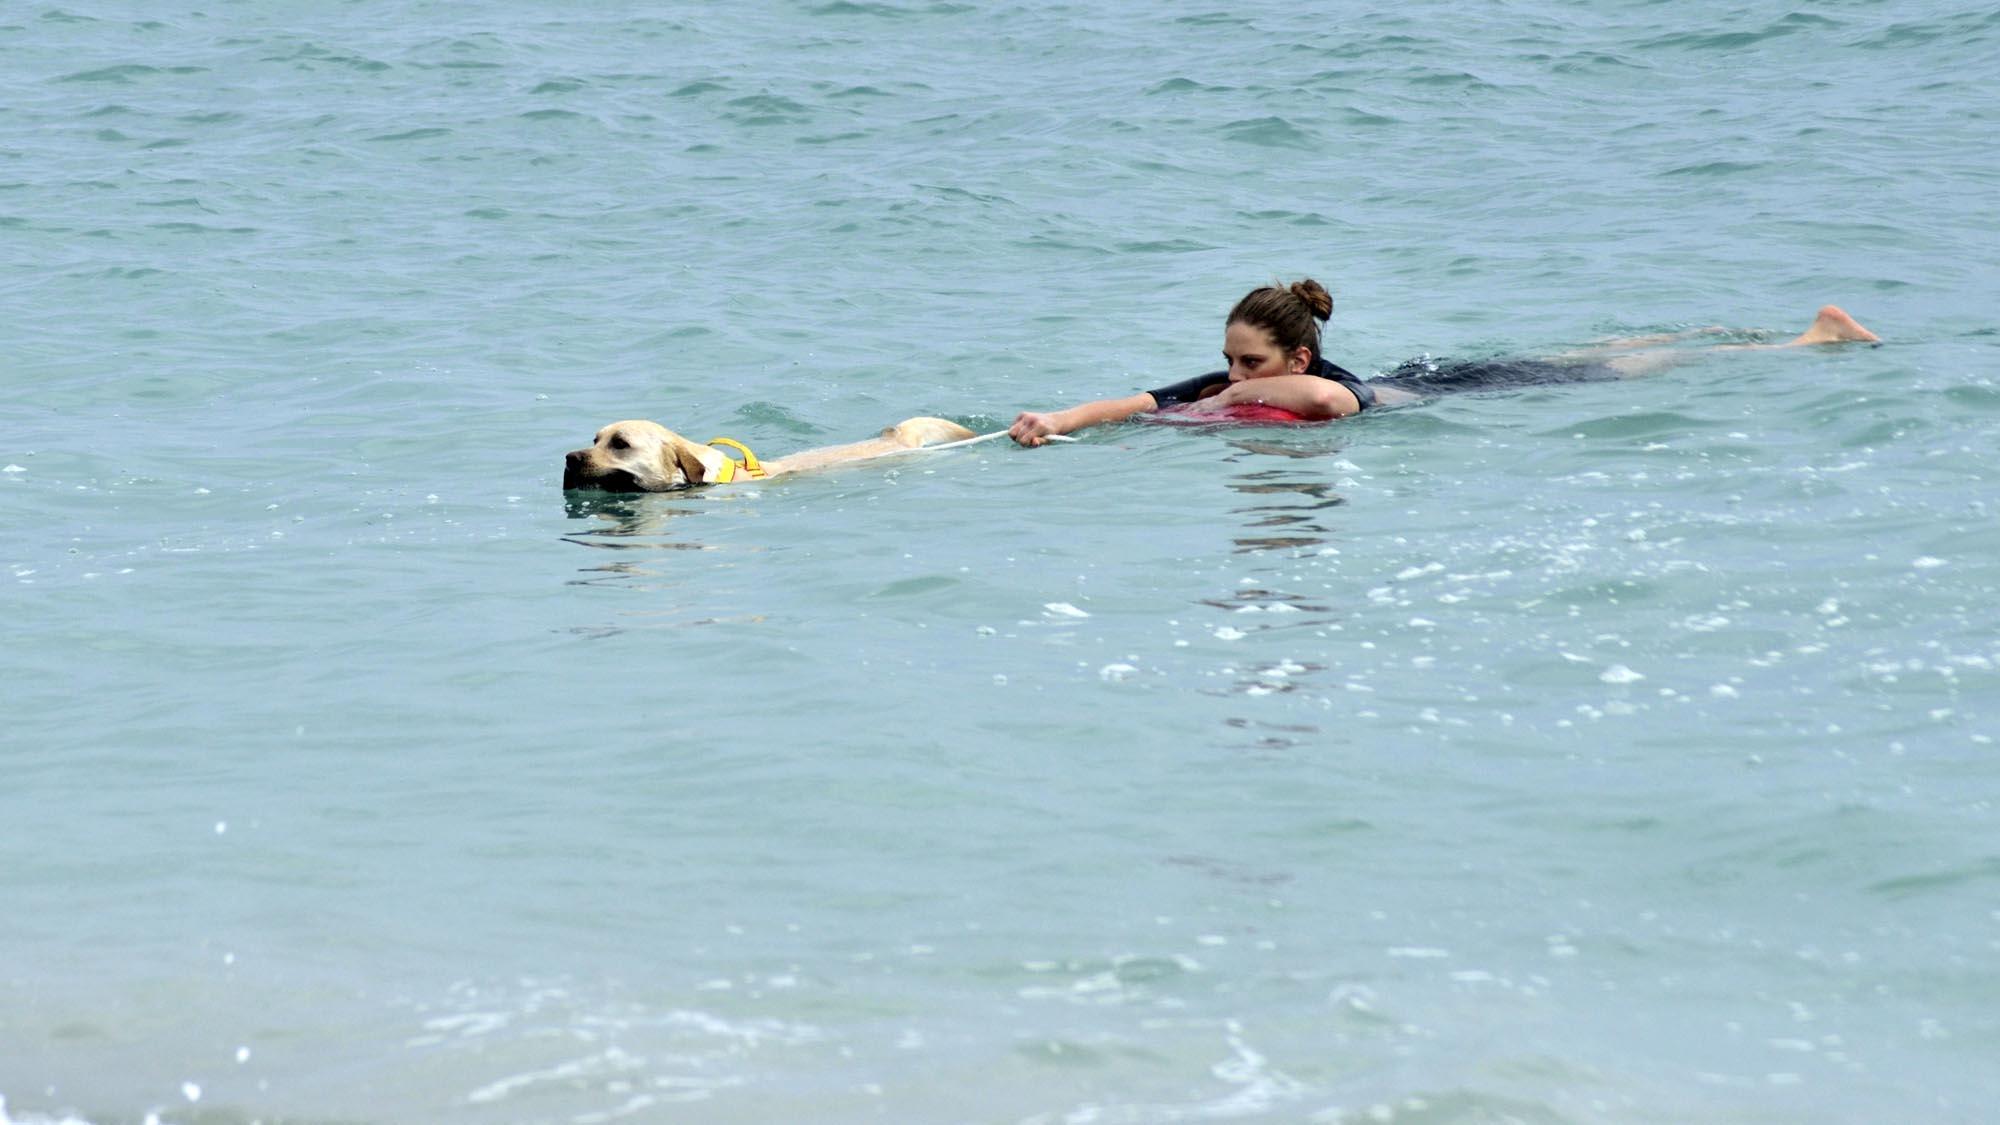 0106 addestramento cani soccorso cinofilo 2 - Soccorso cinofilo Pegasus